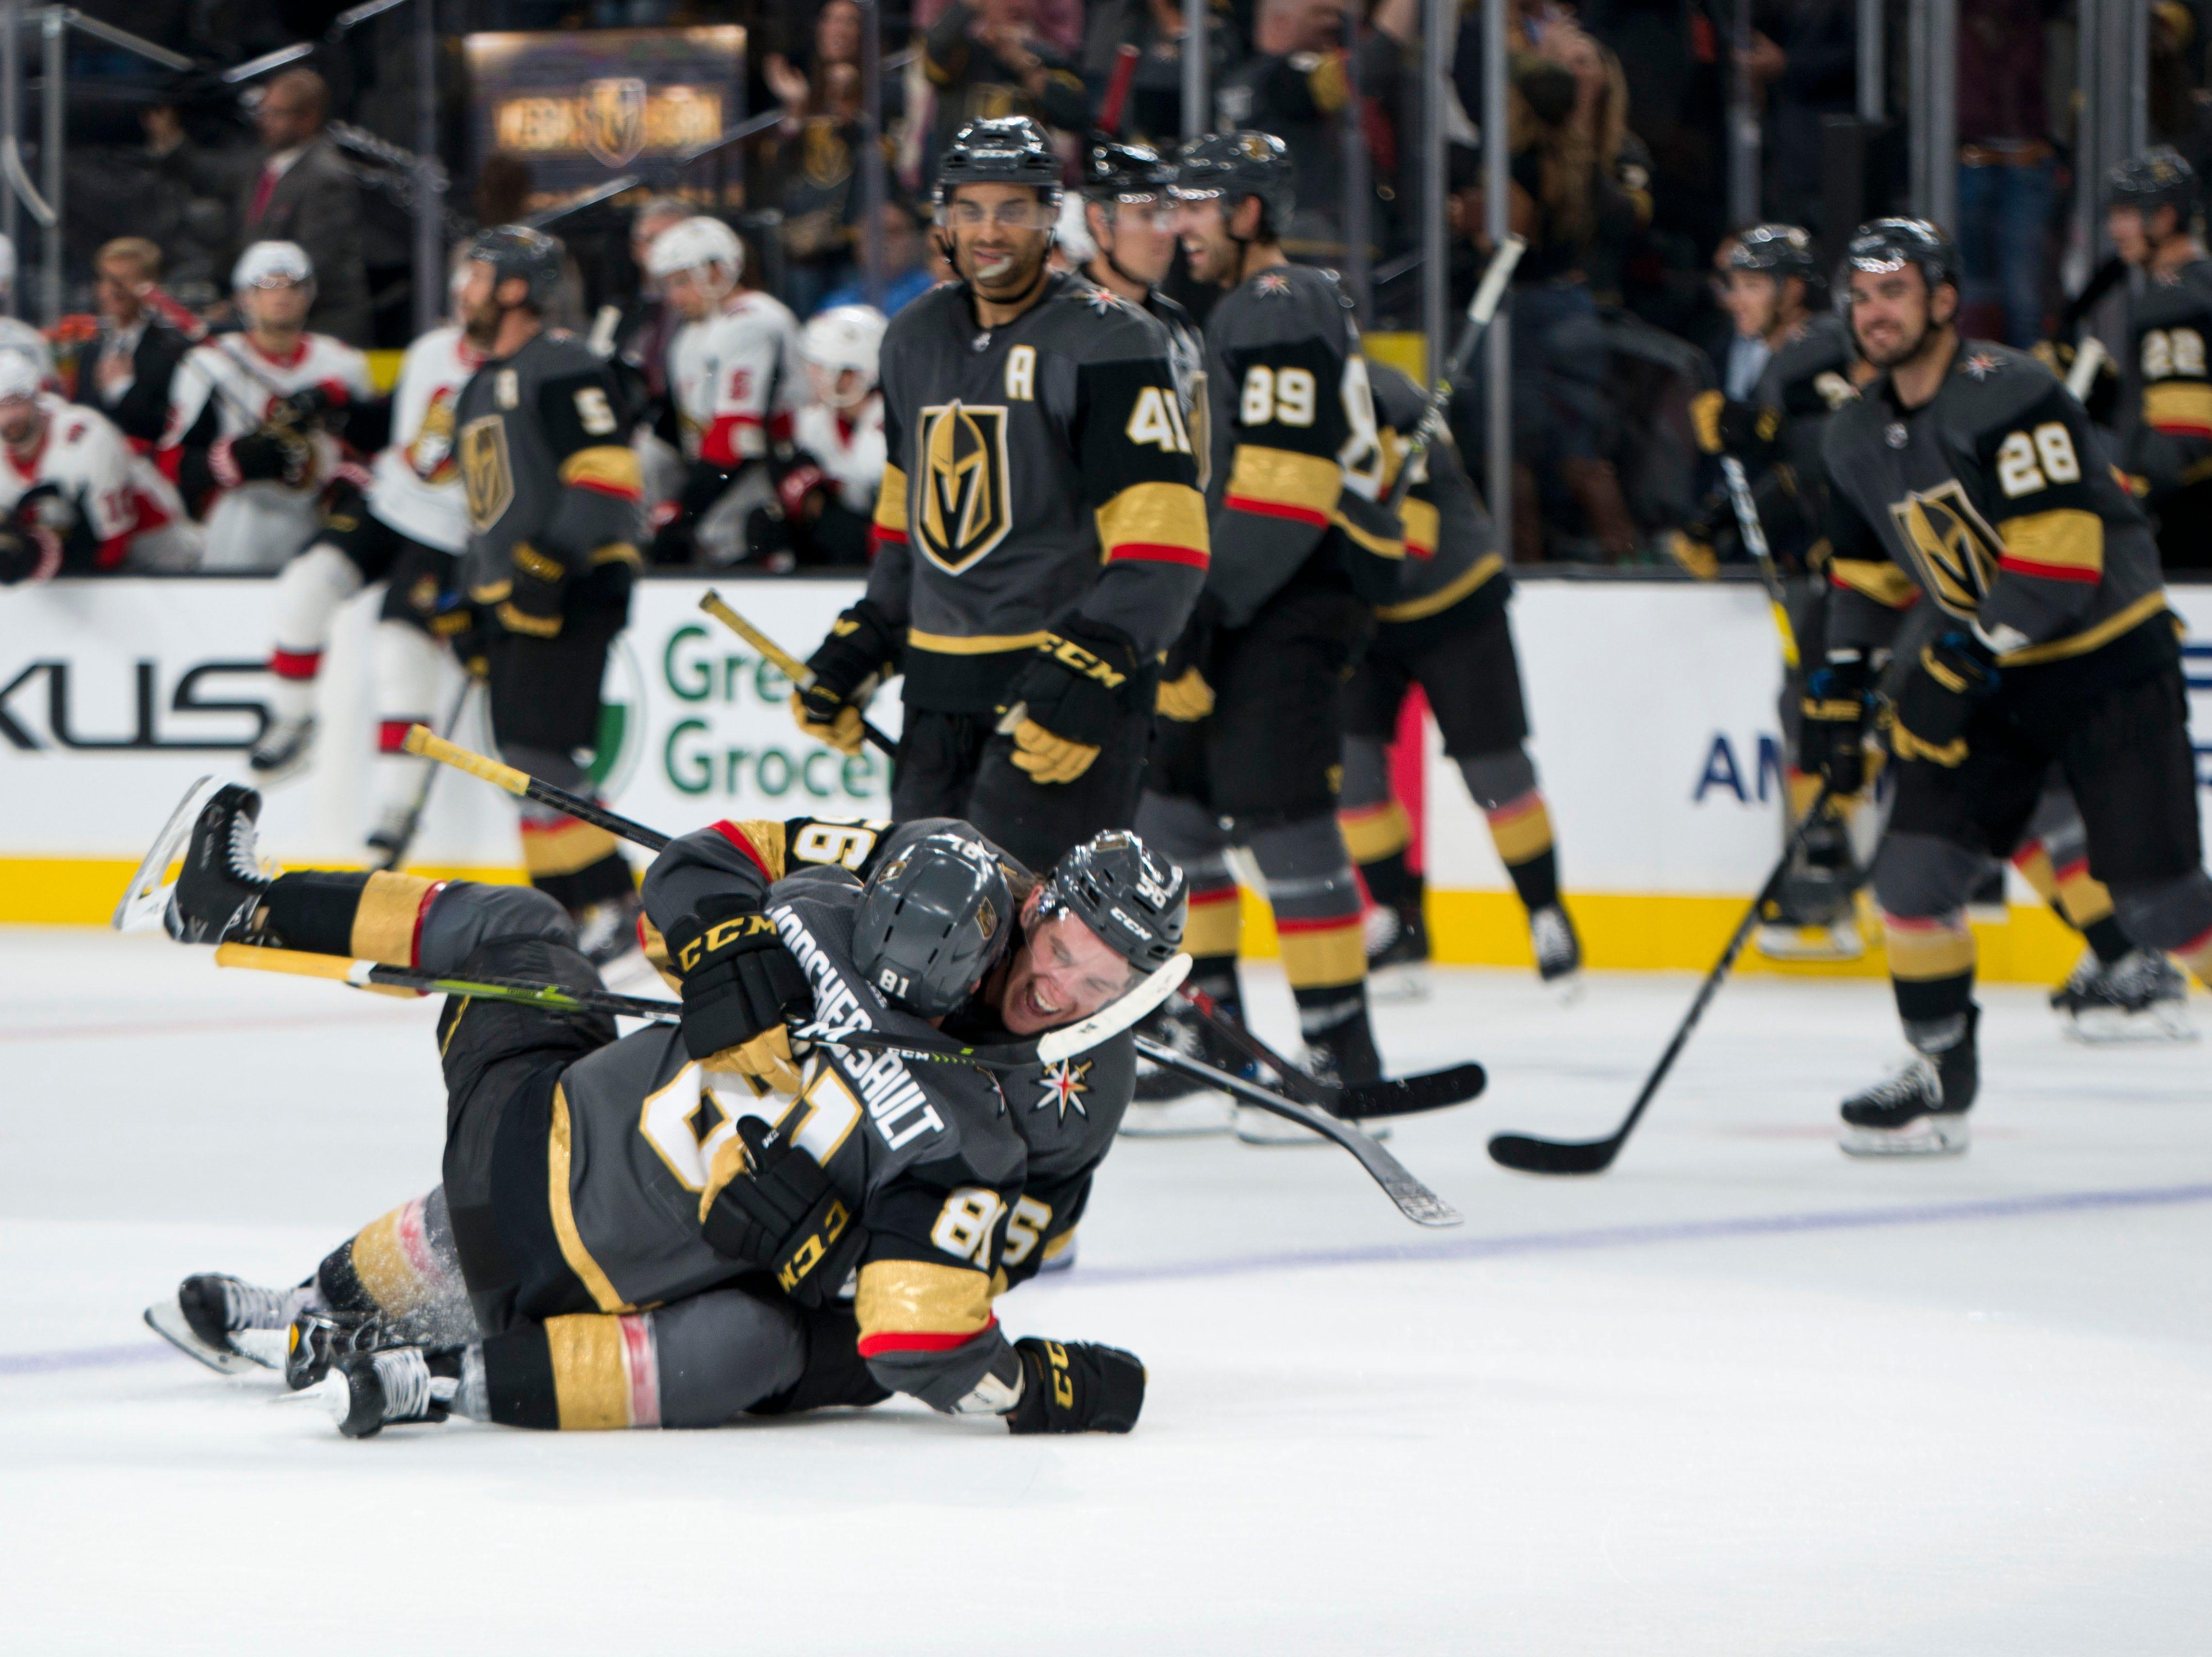 Oct. 28: Vegas Vegas Golden Knights center Jonathan Marchessault (81) celebrates with left wing Erik Haula (56) after scoring the game-winning goal in overtime against the Ottawa Senators.